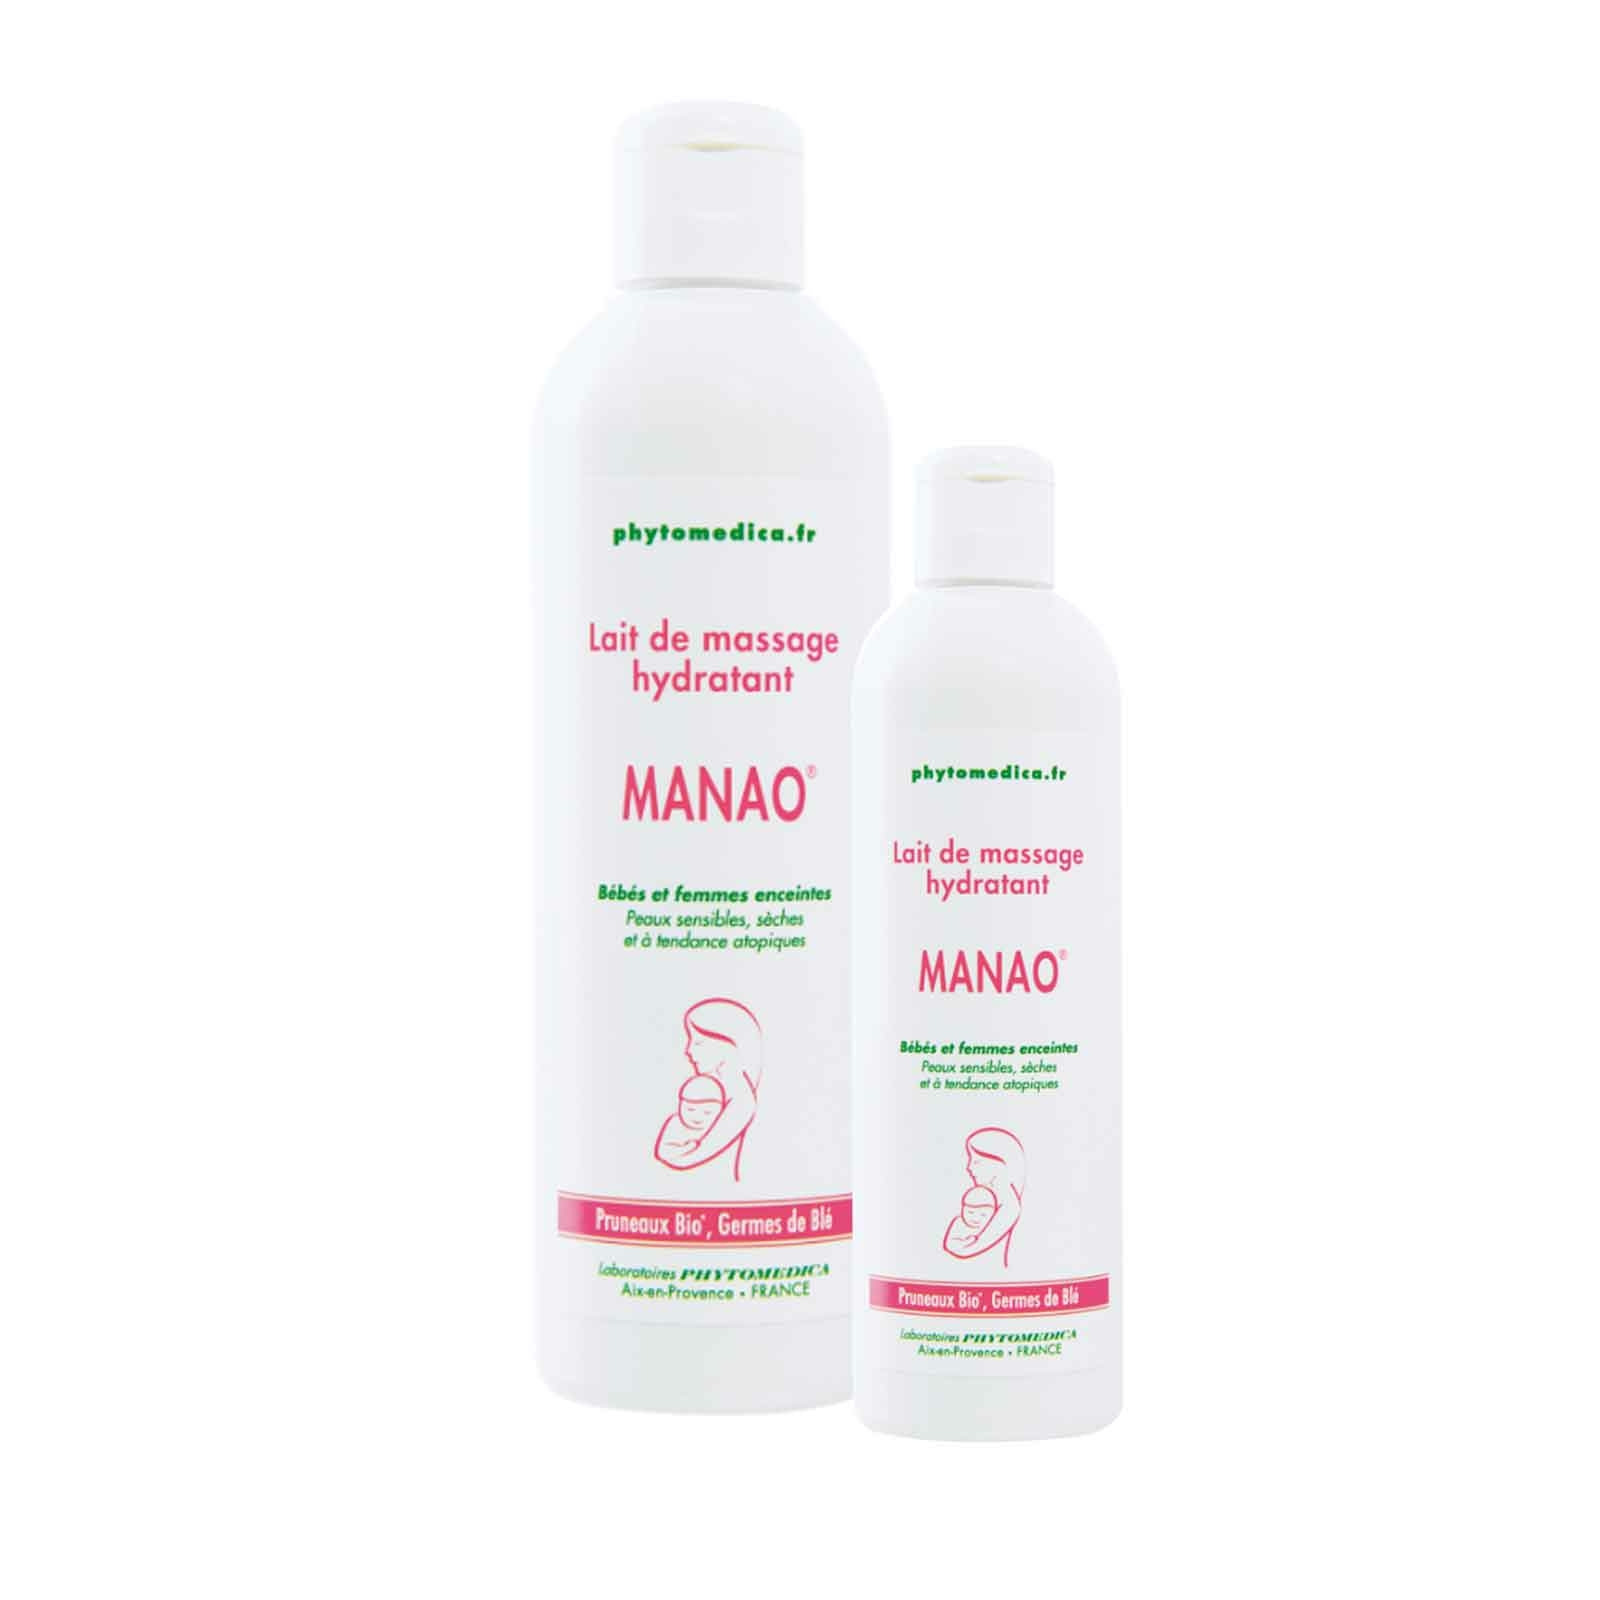 Lait de massage MANAO Phytomedica